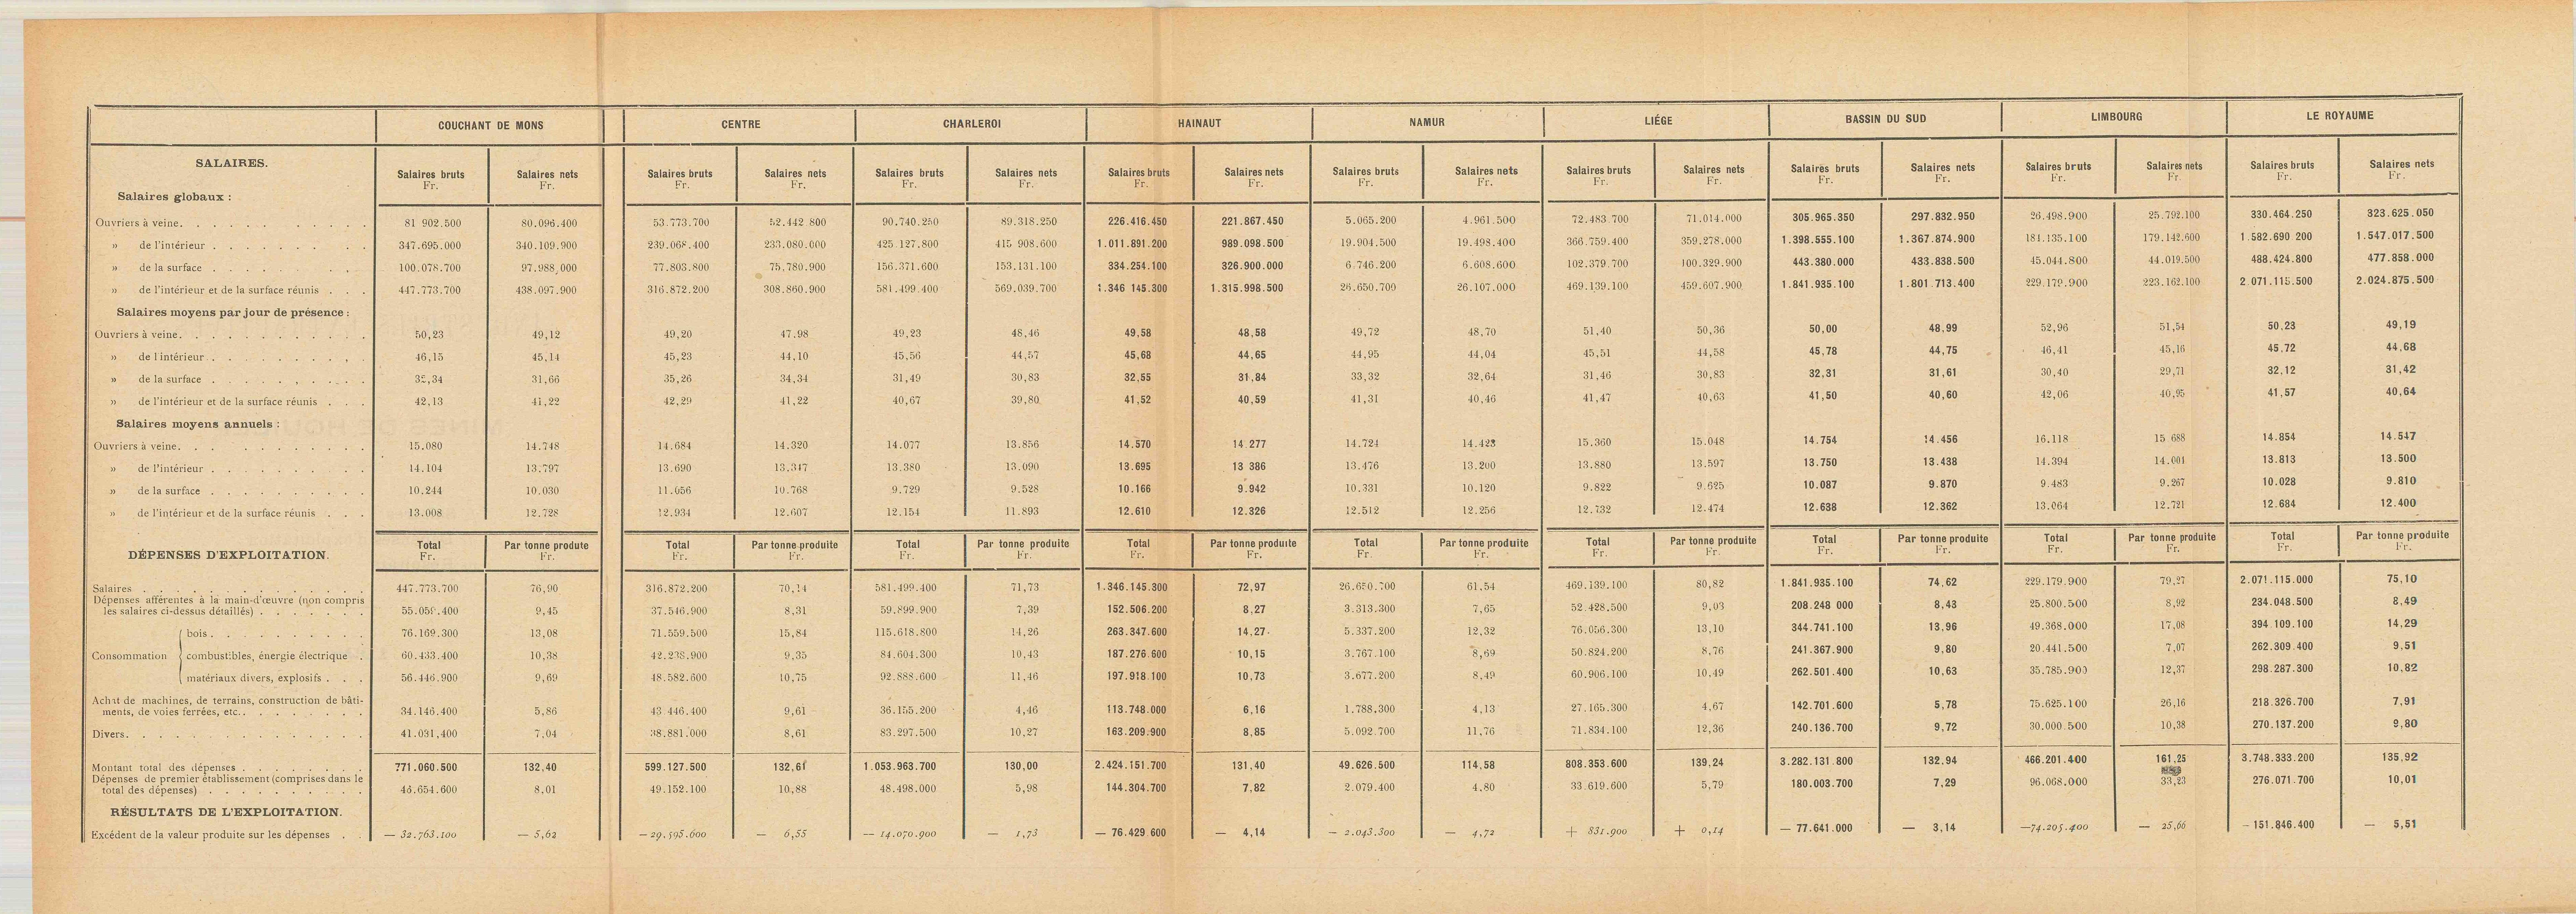 1929 1181 3 tab.jpg